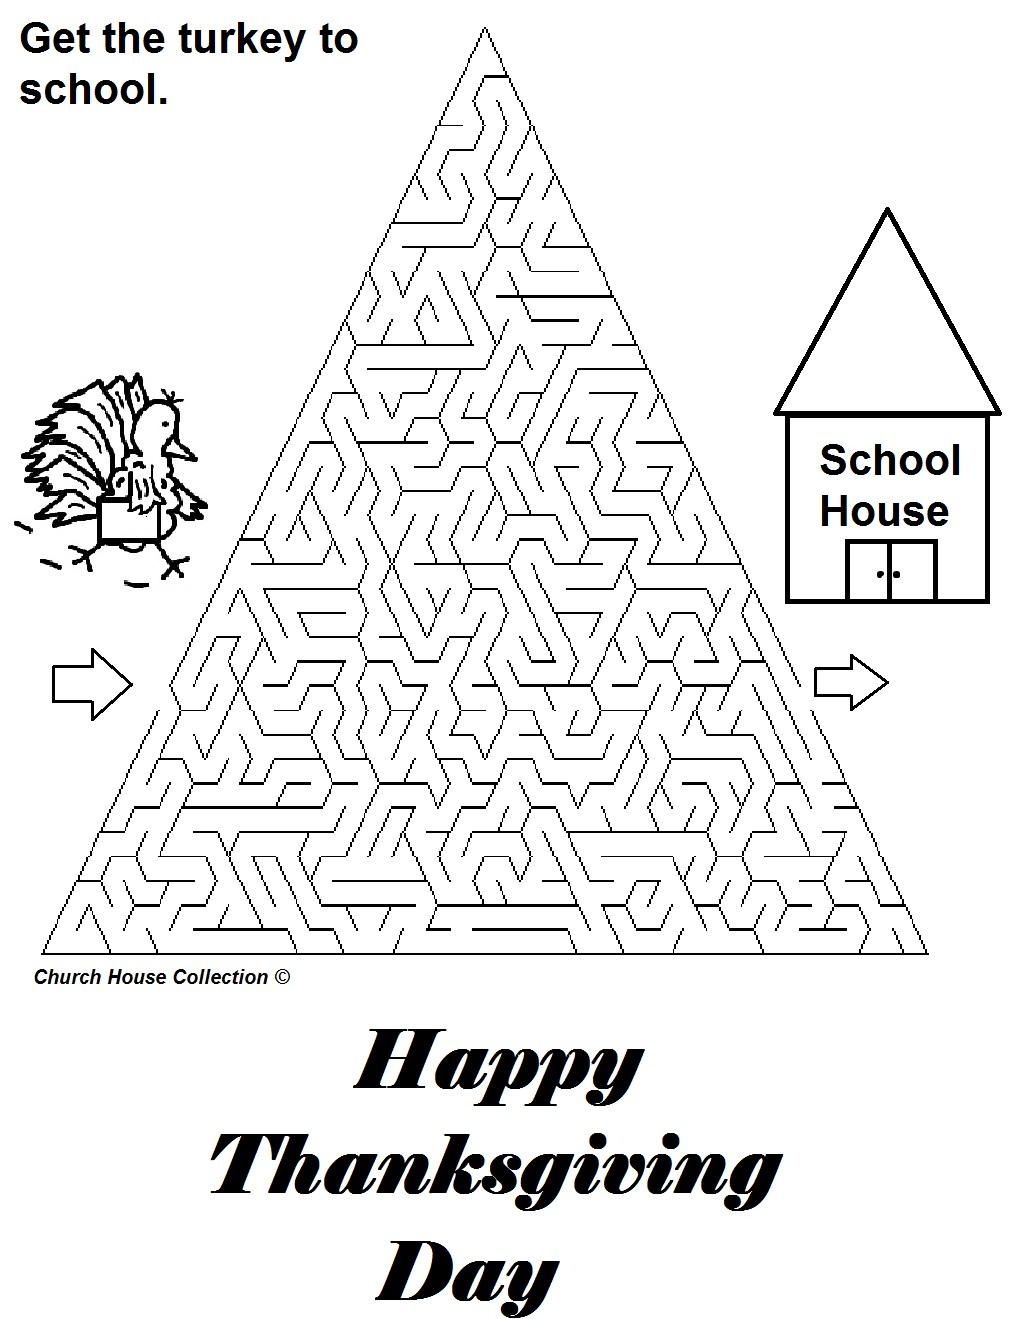 Church House Collection Blog Turkey Mazes For School Teachers